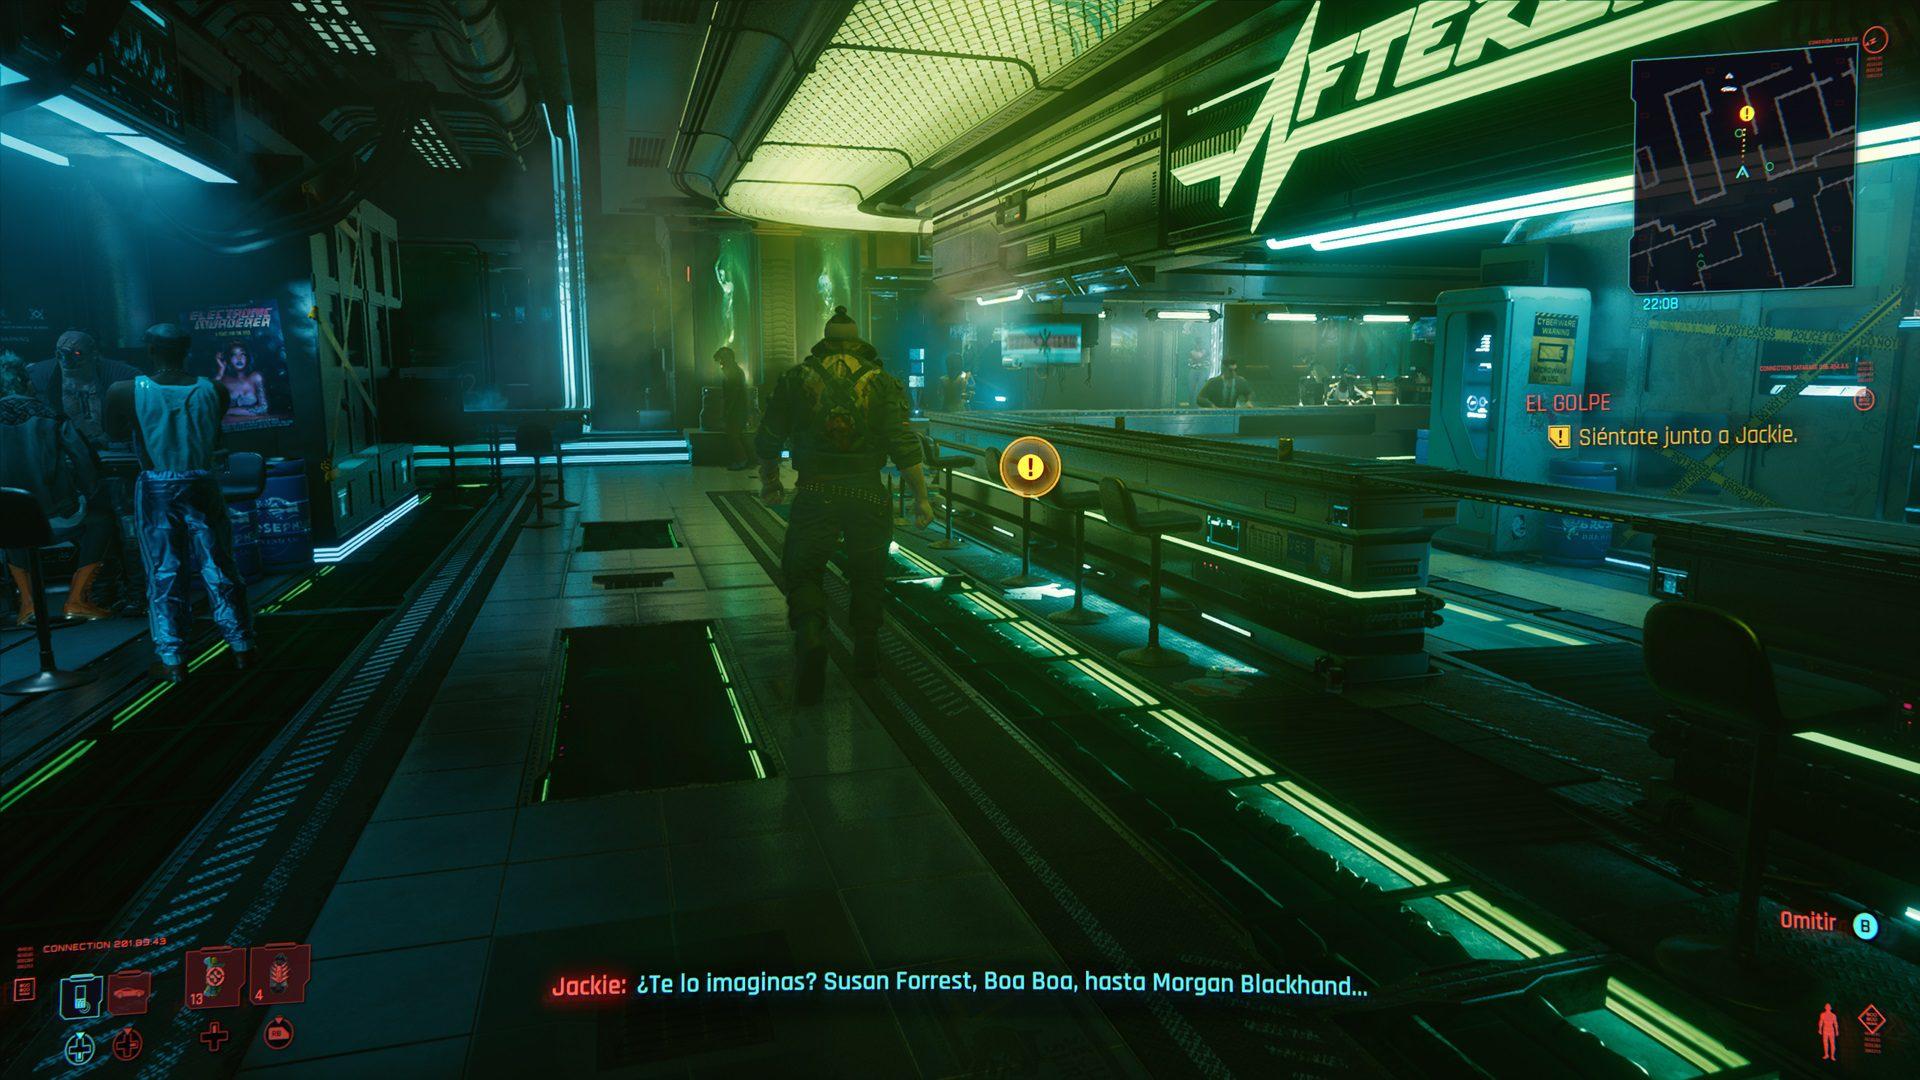 Análisis de Cyberpunk 2077 - Xbox Series X